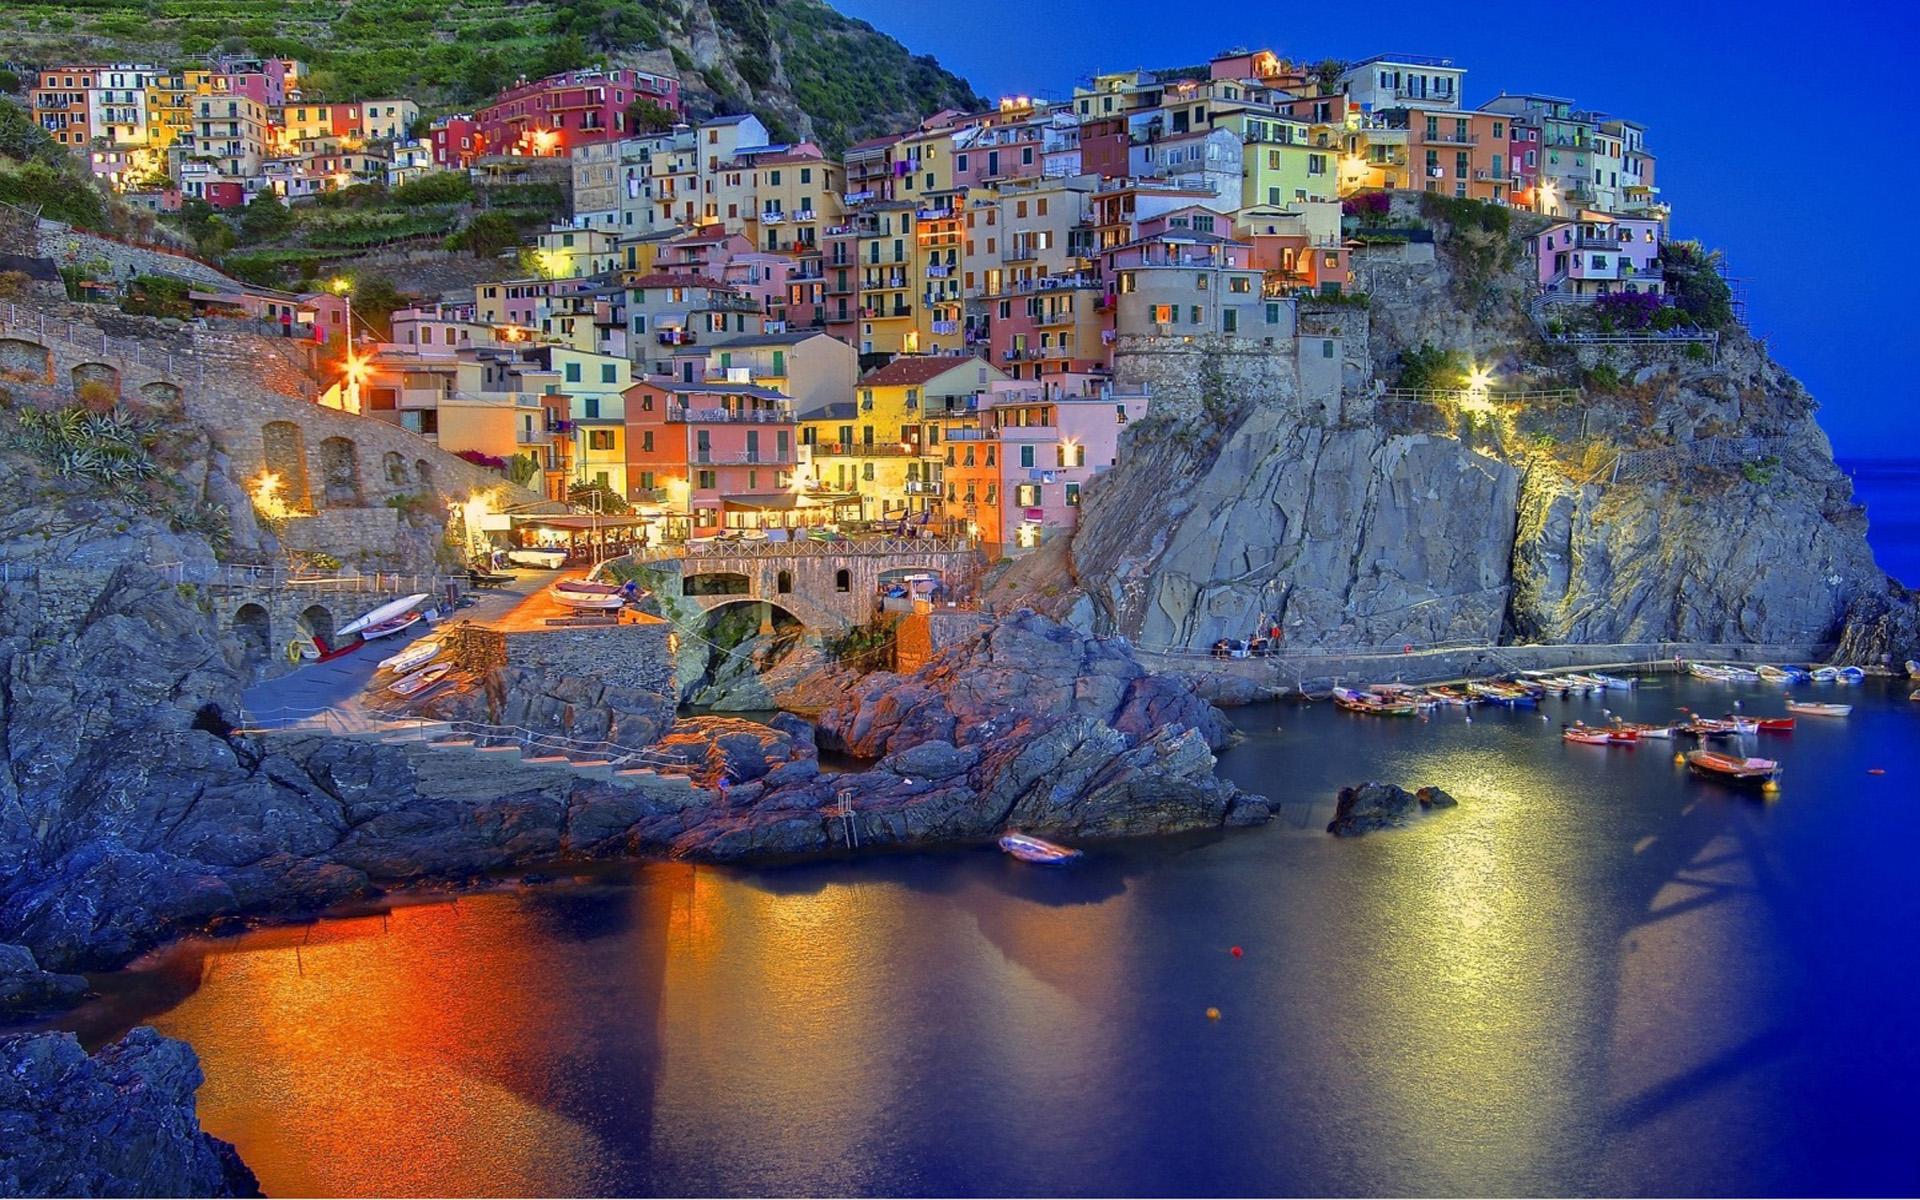 Amalfi Coast In Liguria Italy Desktop Background 70635 1920x1200